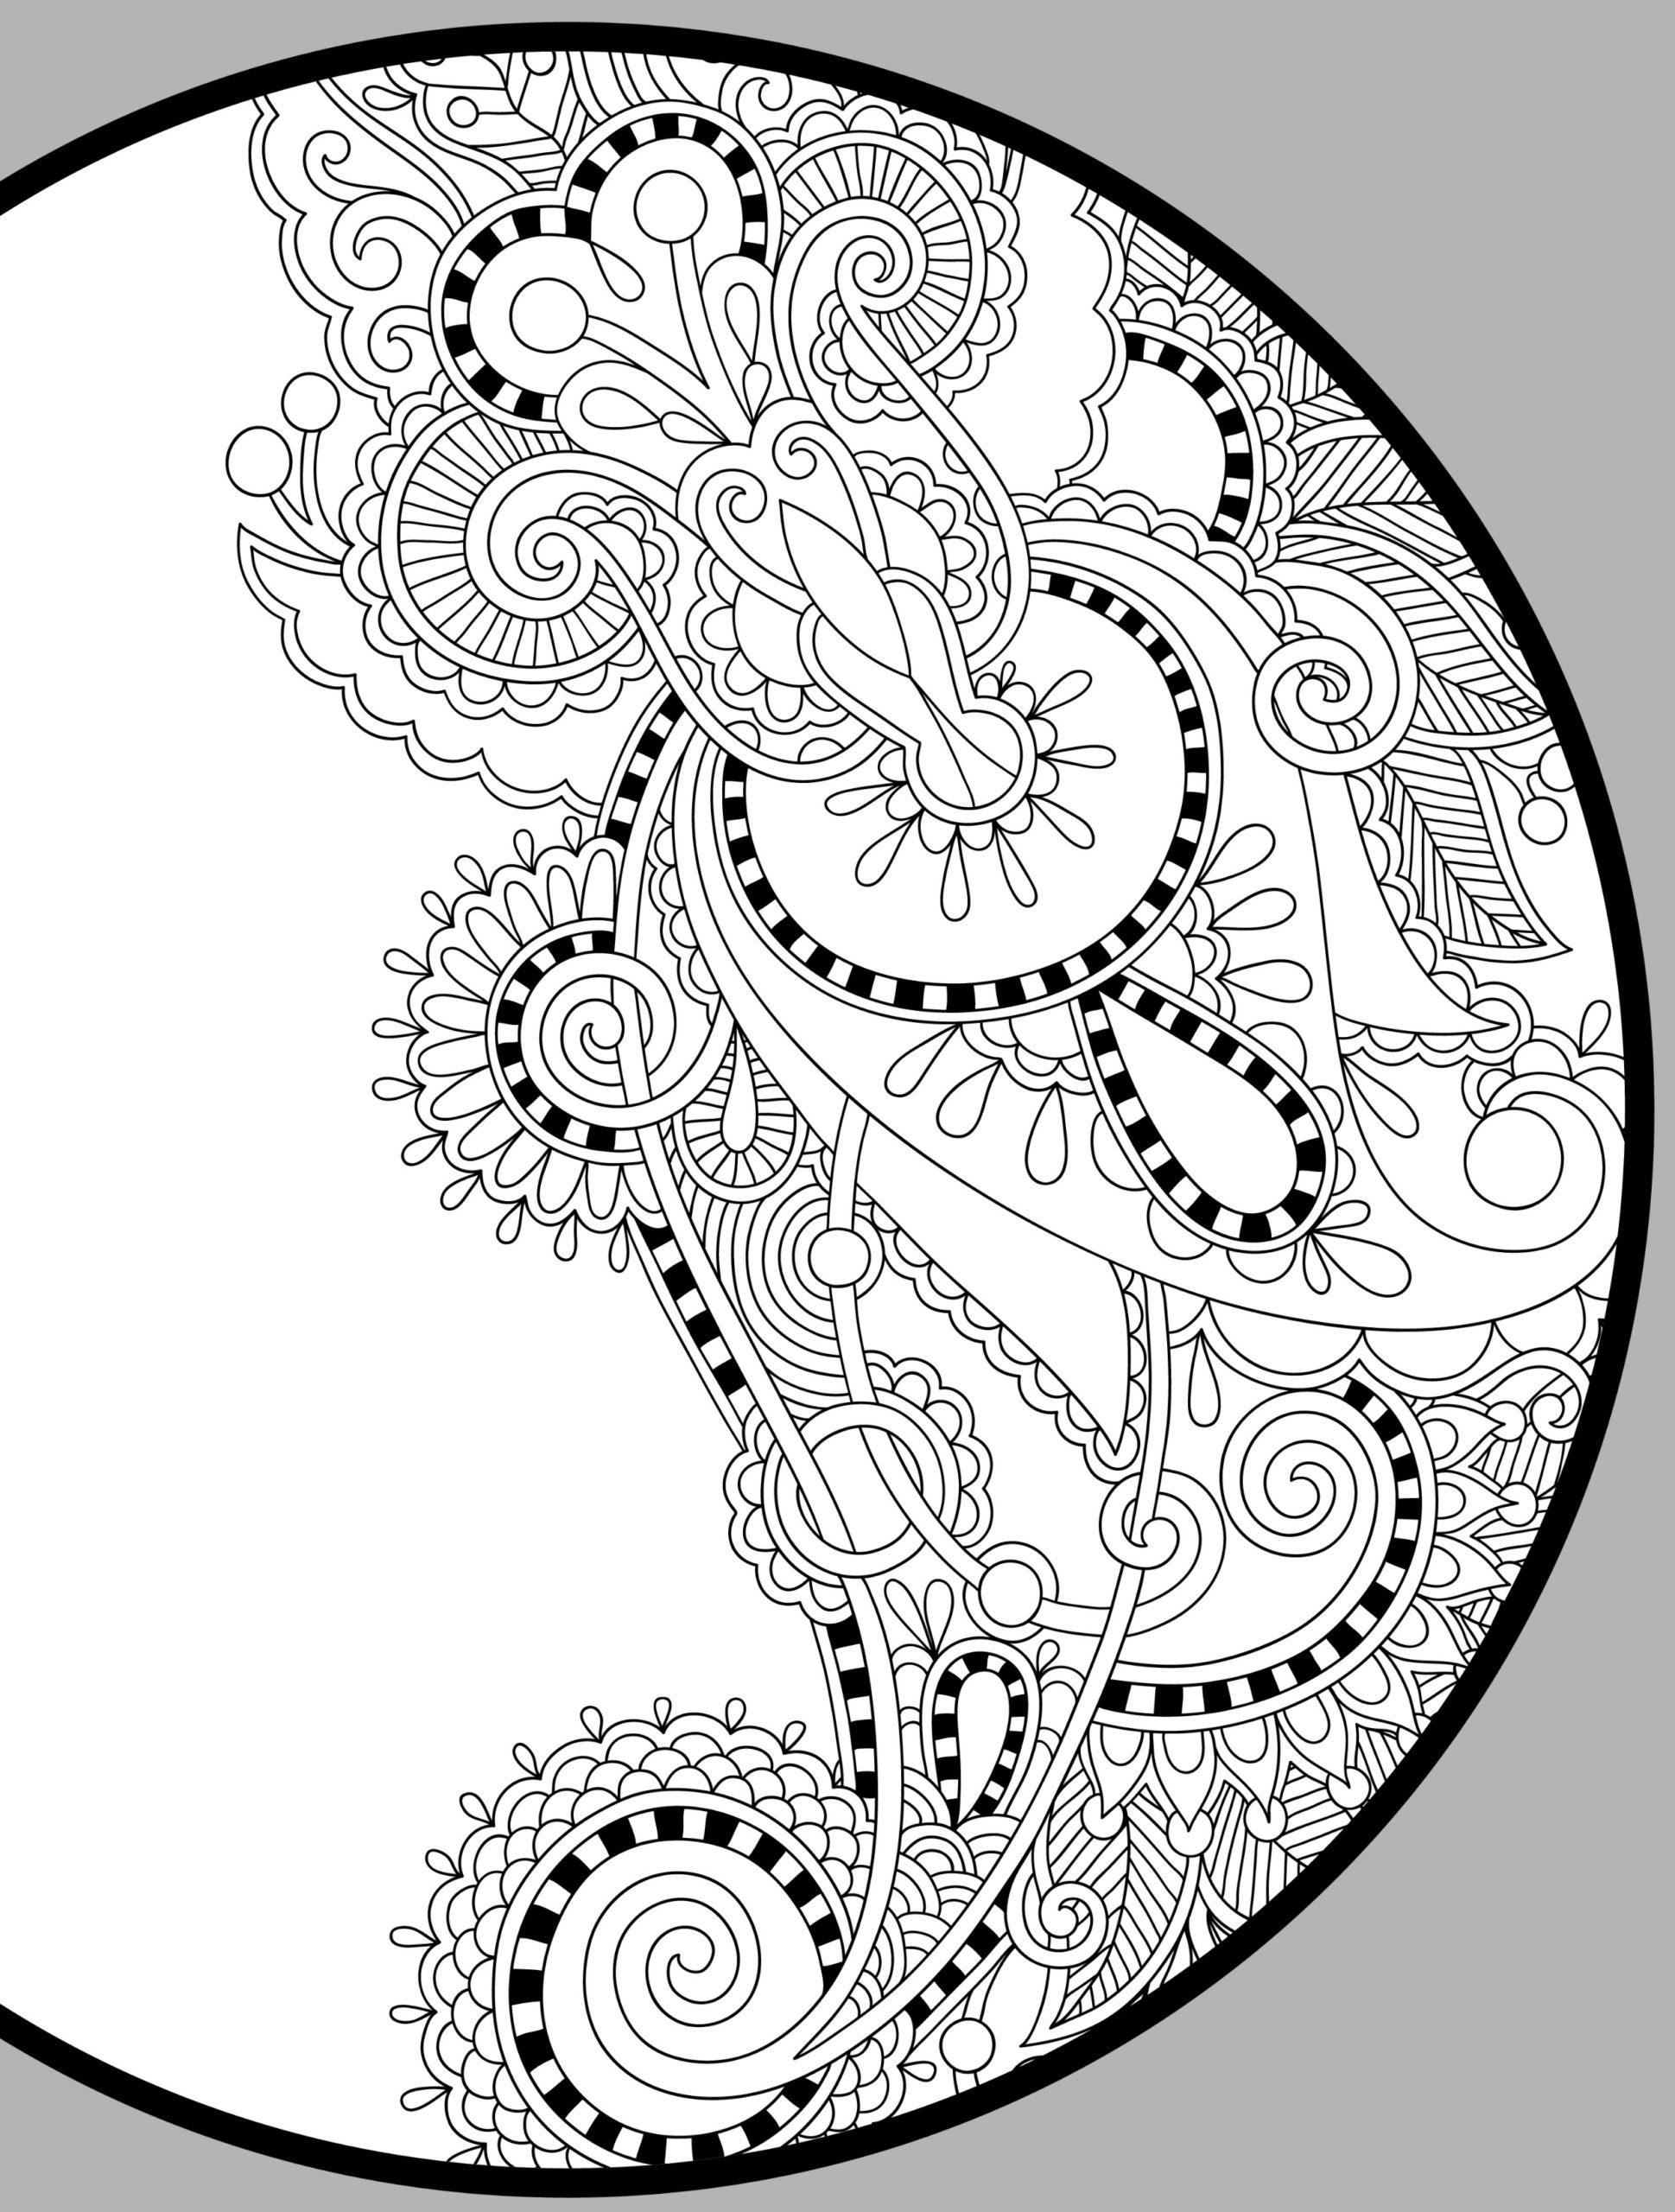 Coloring Pages : Best Coloring Free Printable Books Pdf For intérieur Mandala Fée